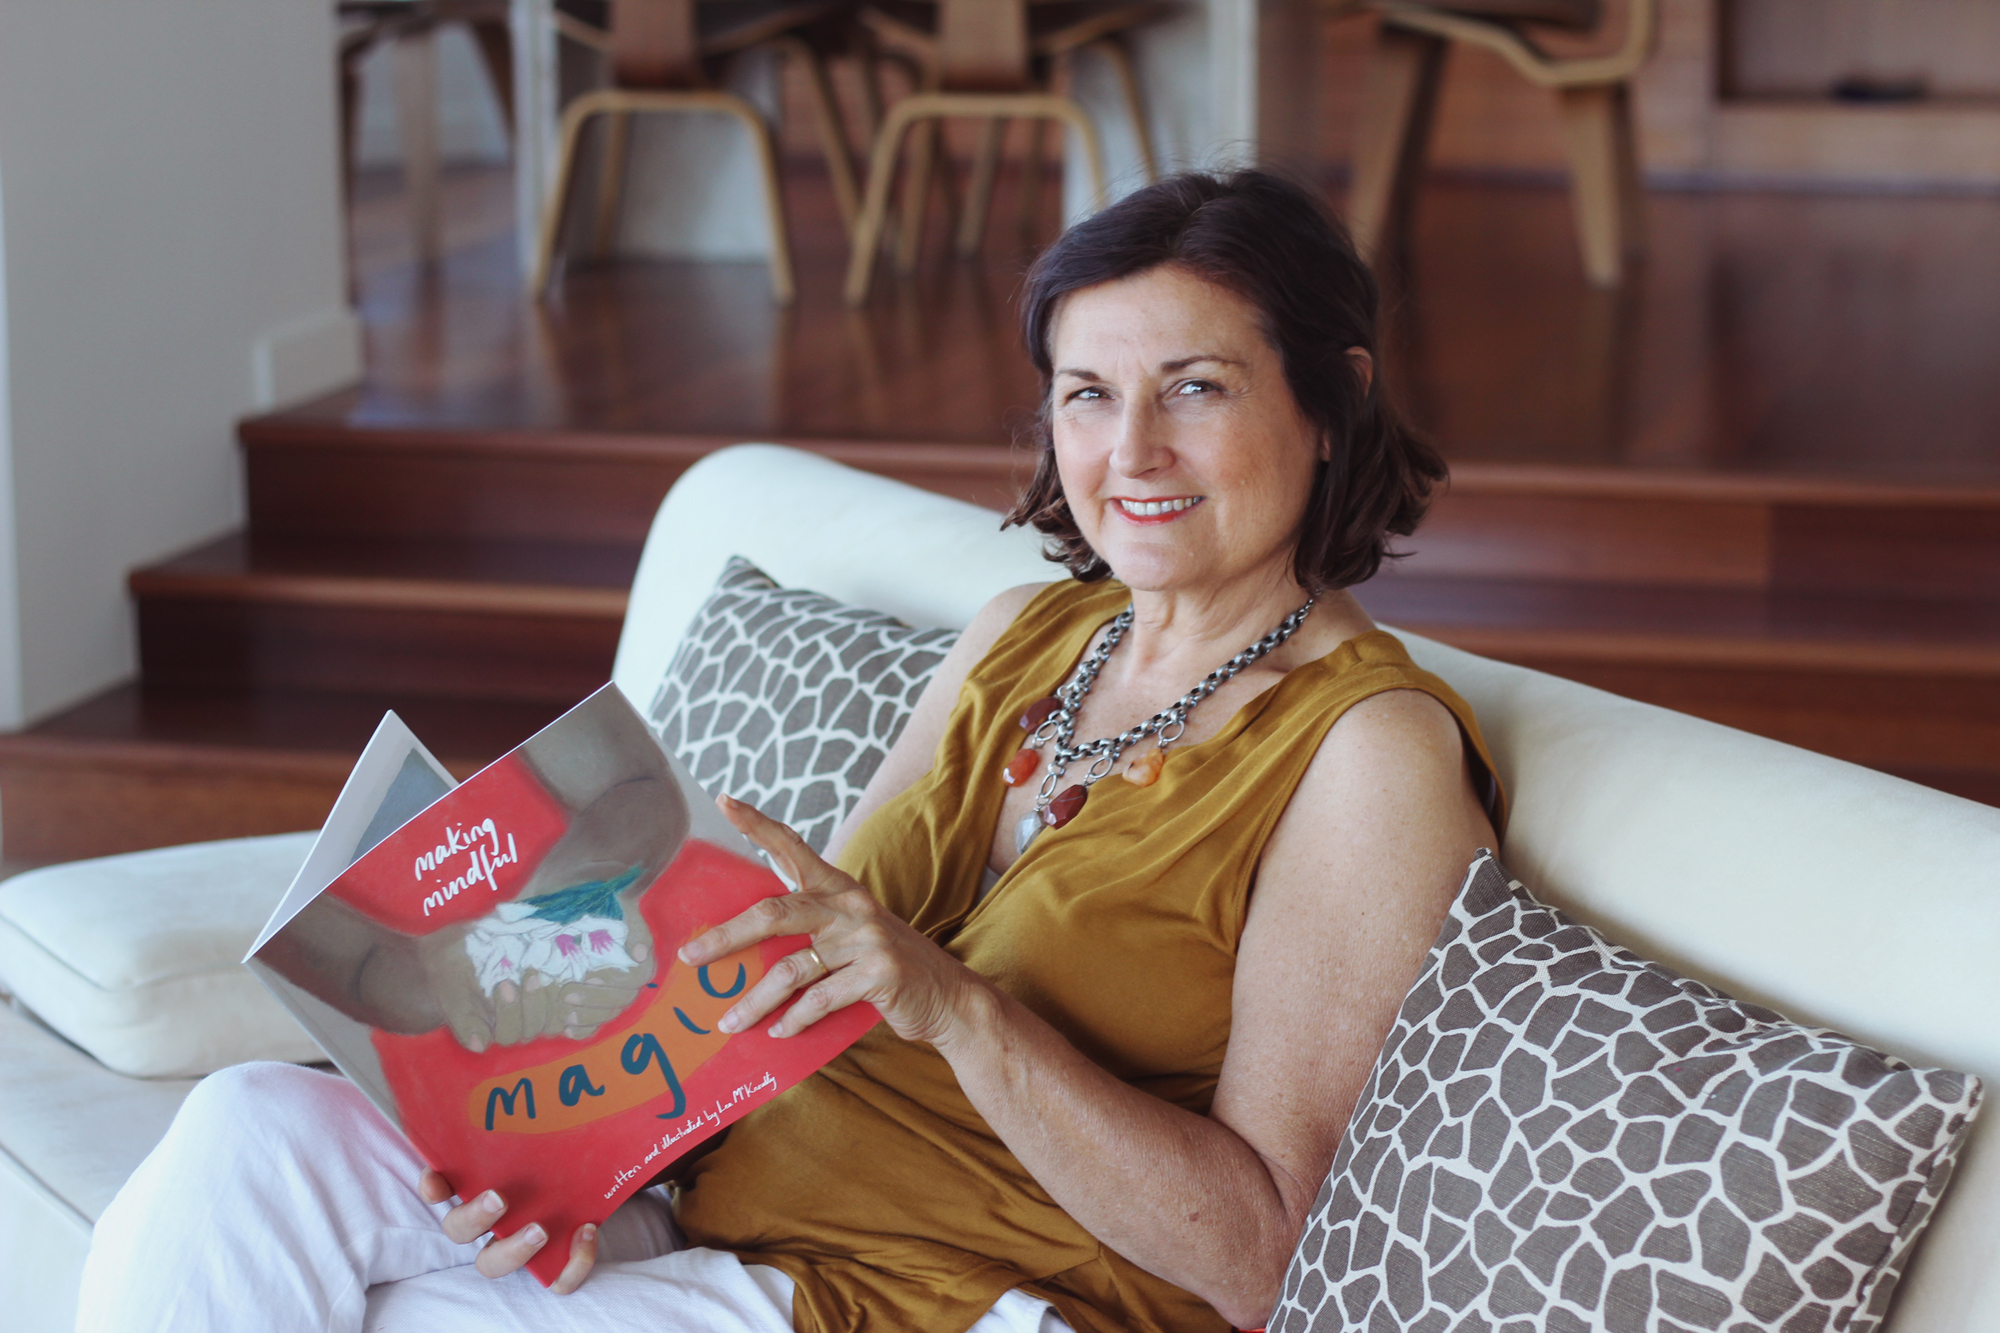 Lea McKnoulty, author & illustrator of Making Mindful Magic.